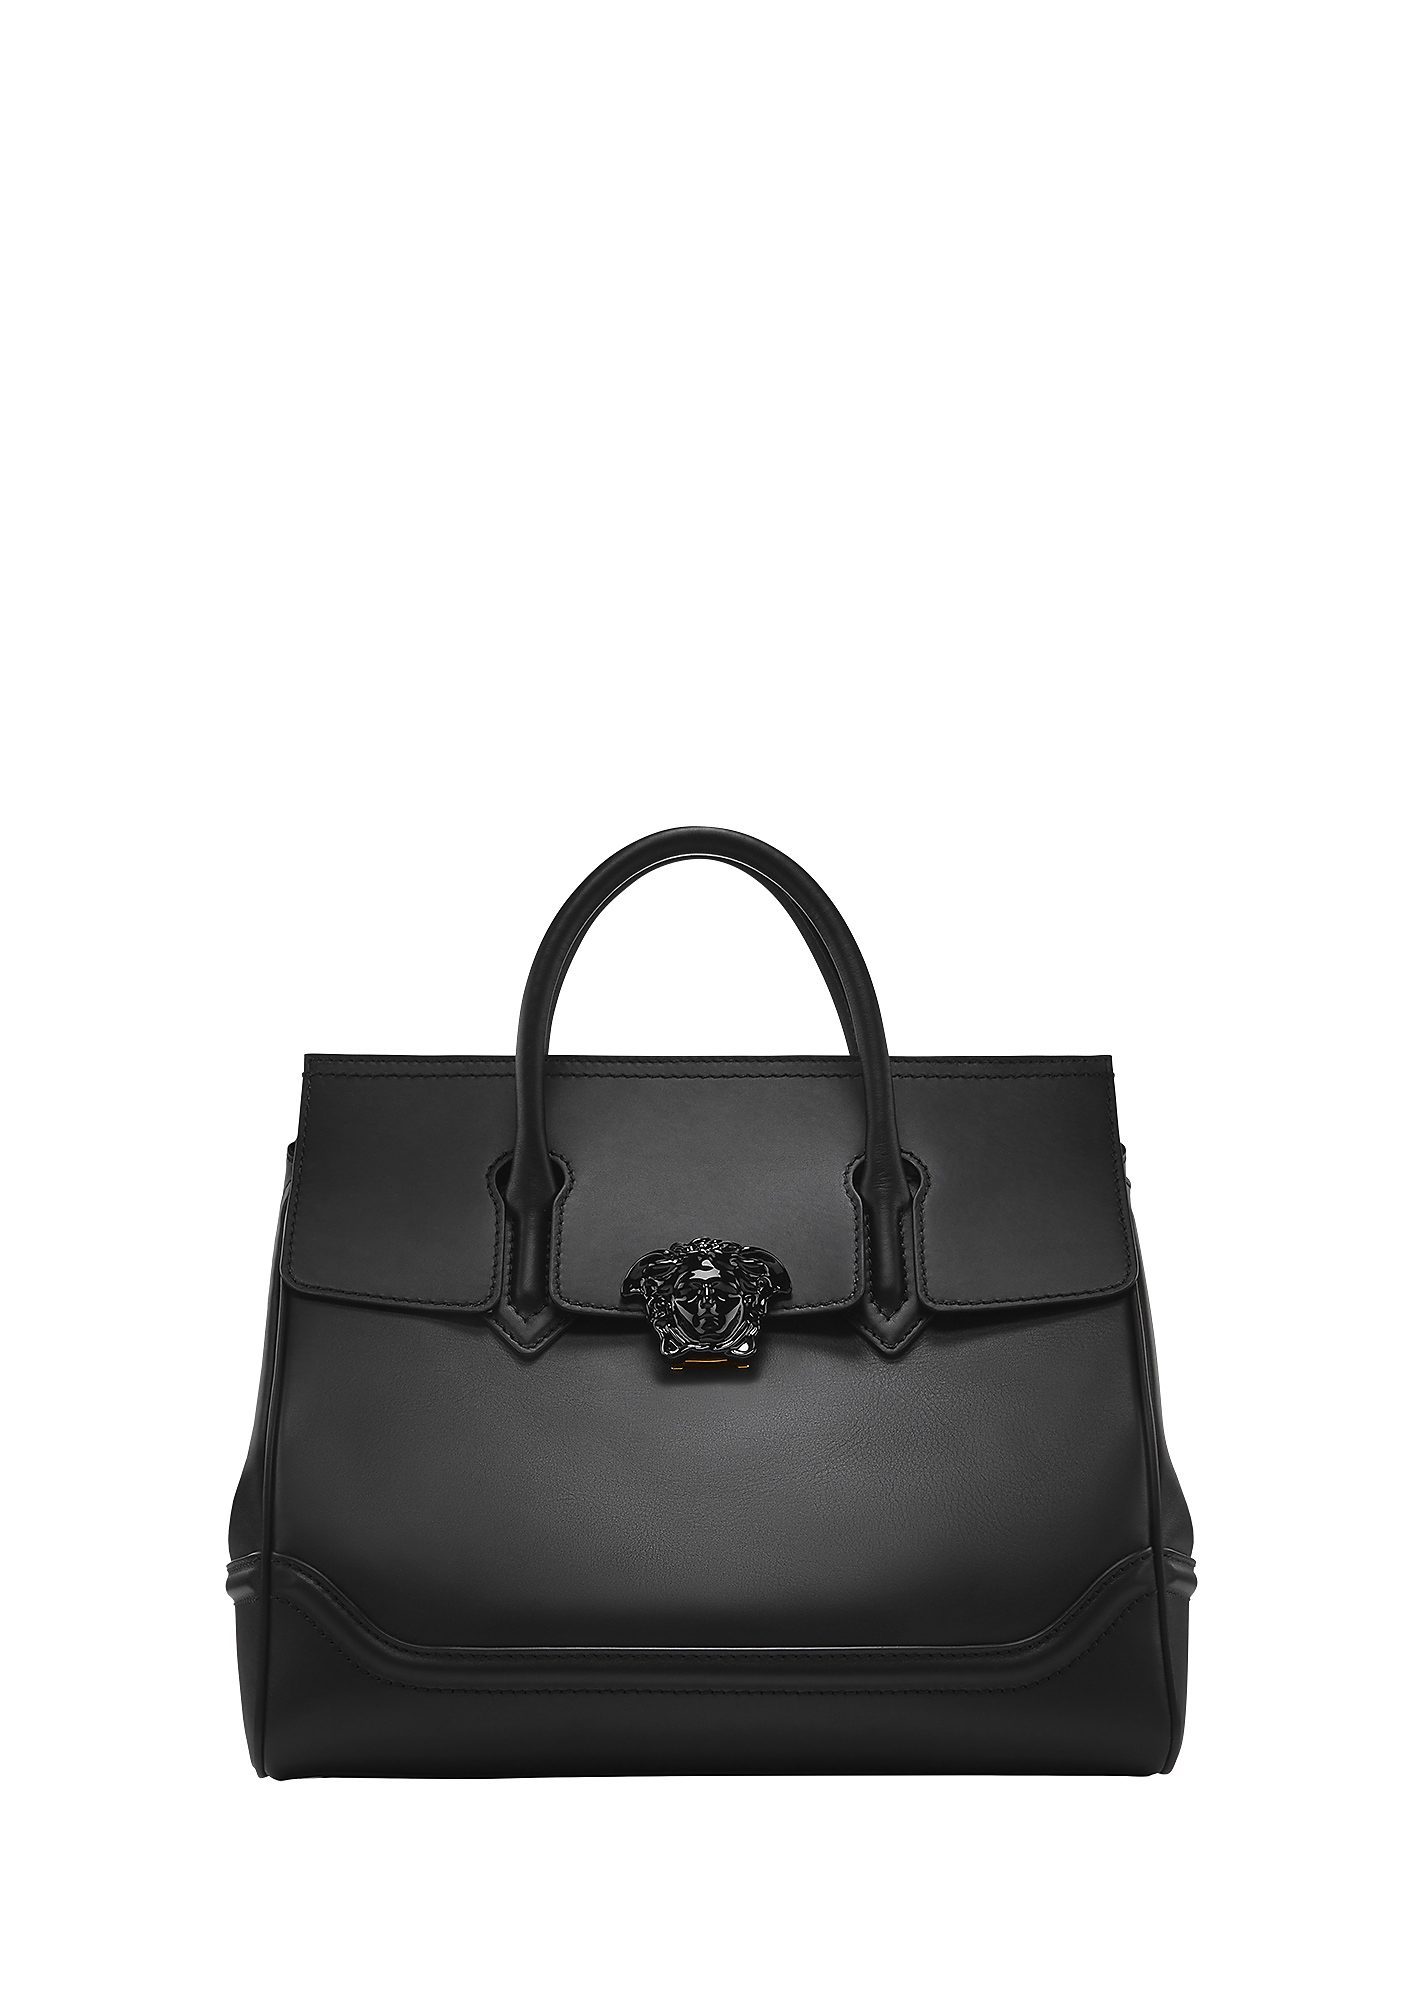 41f45eef3504 Versace Palazzo Empire Black Leather Large Handbag In Knjoc